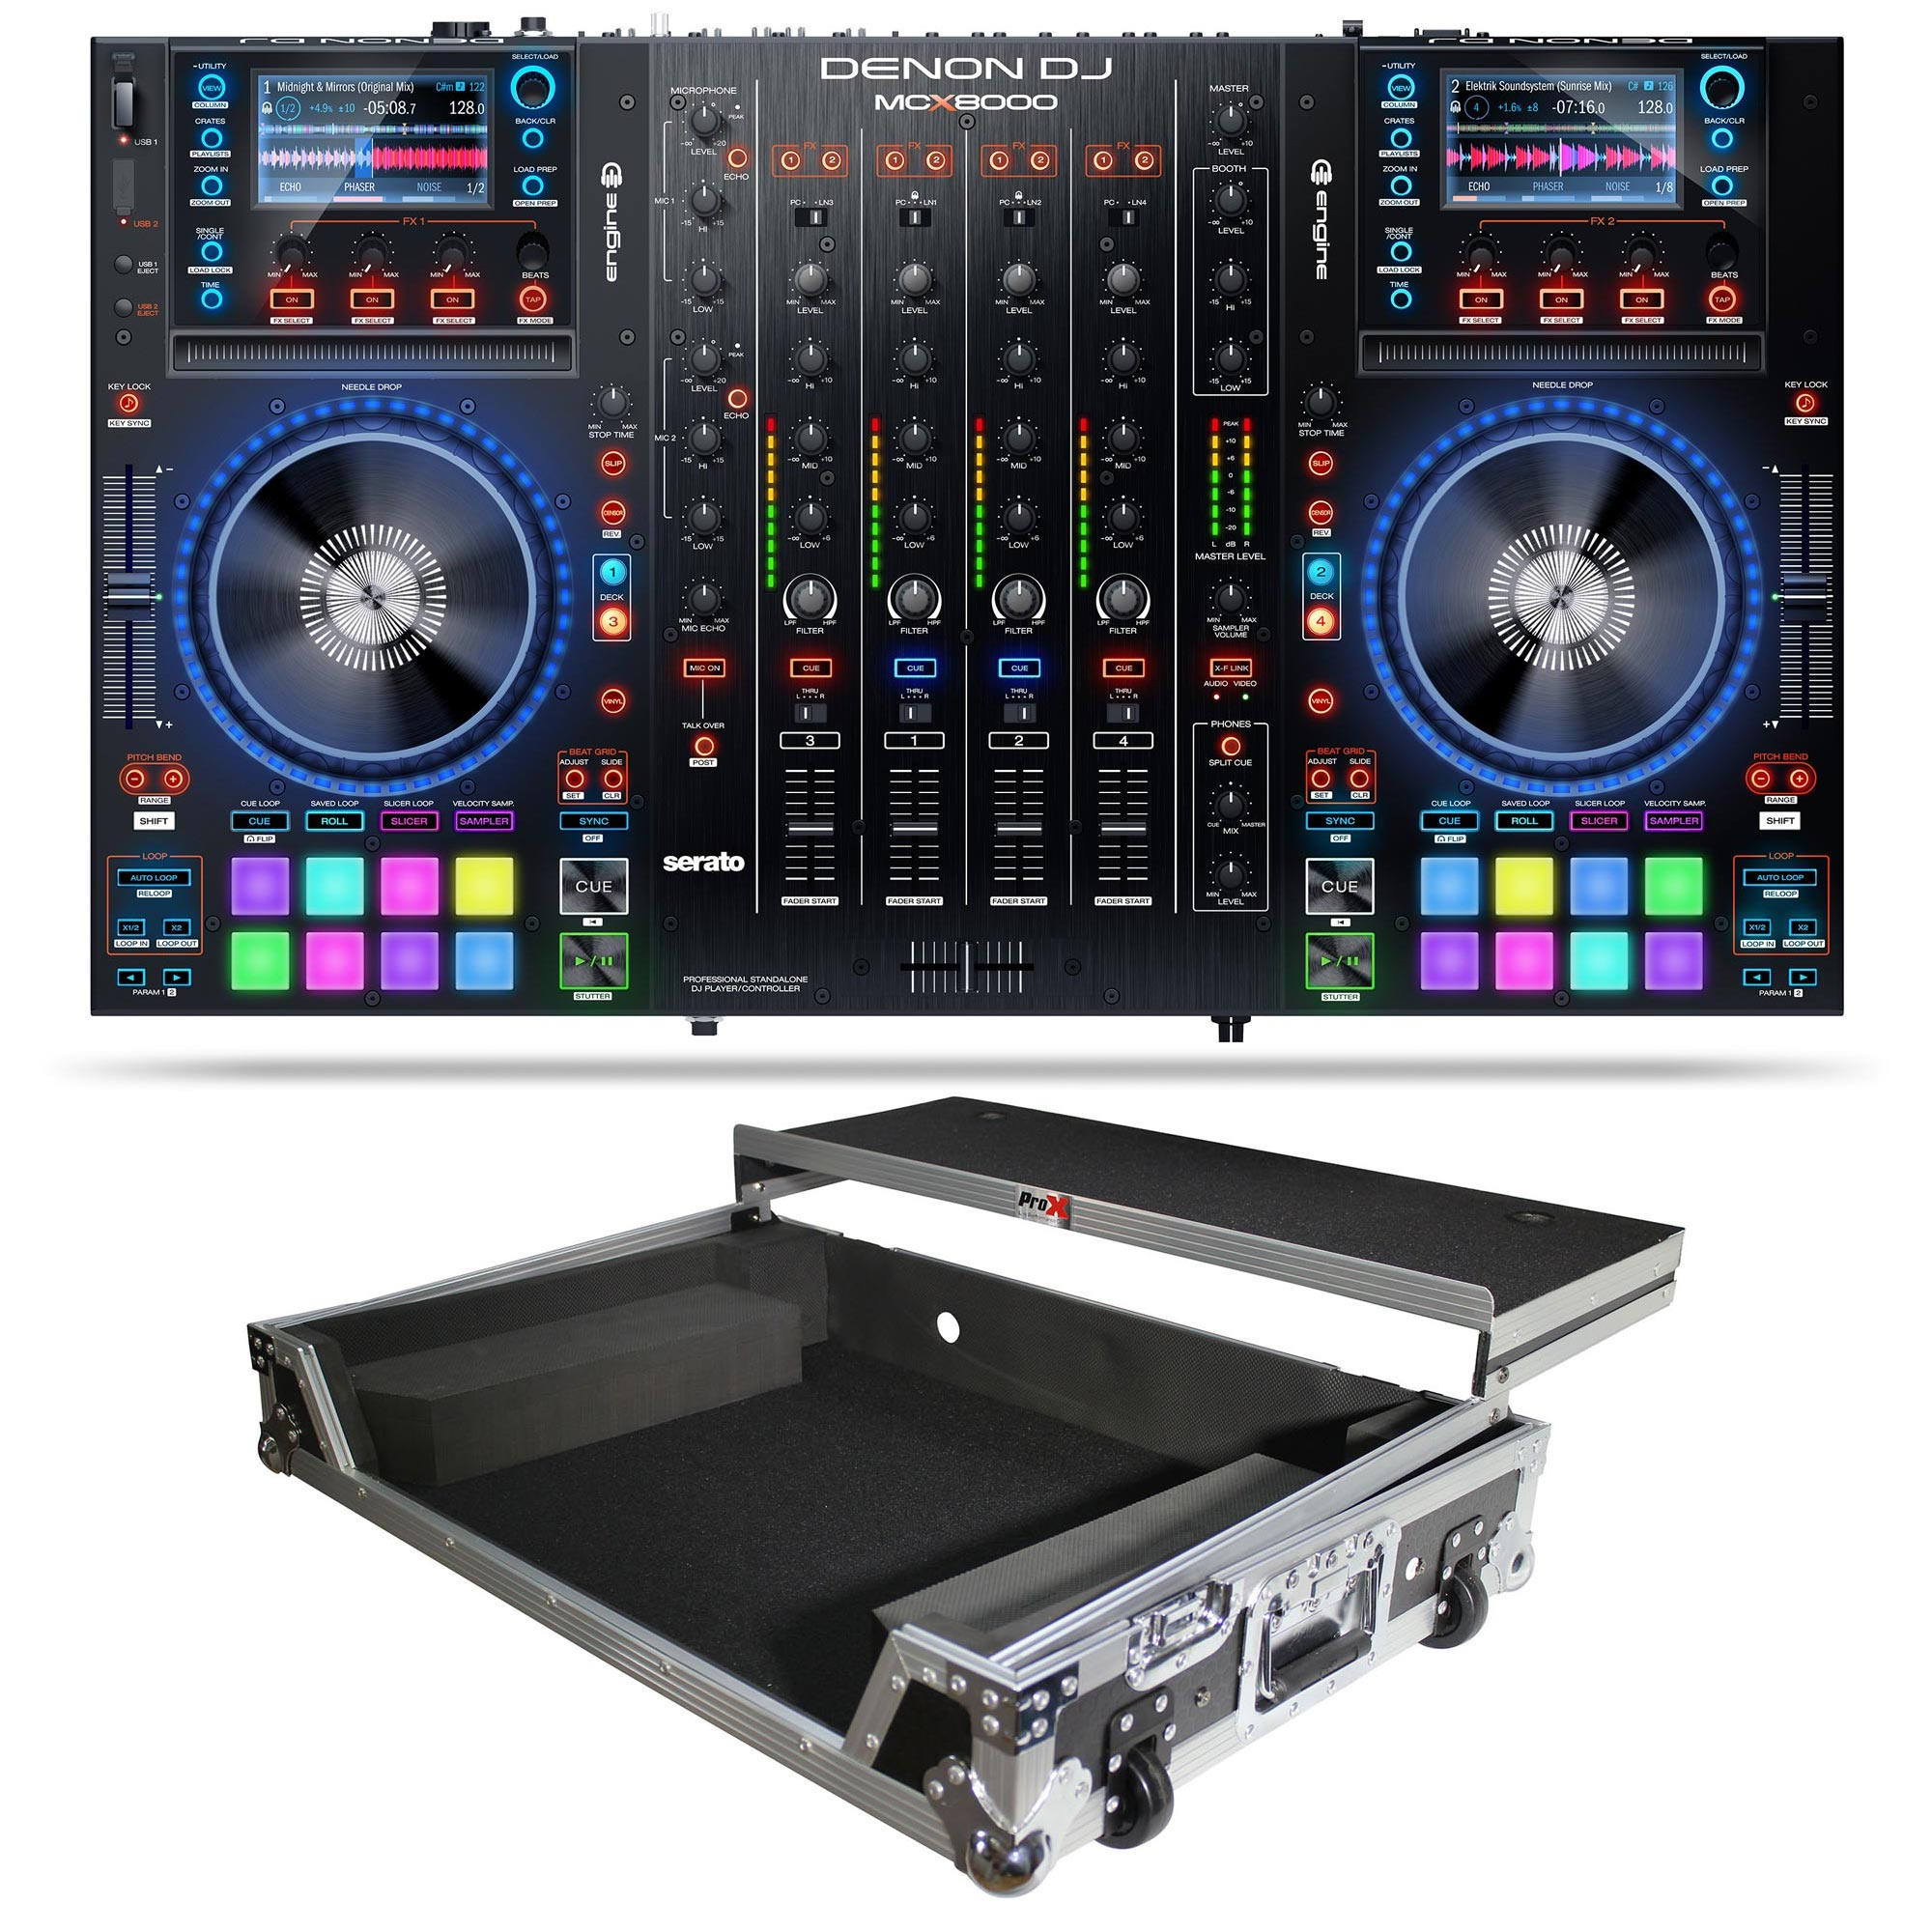 DENON DJ MCX8000 Controller for Serato DJ & Engine Bundle with Slide Shelf  Flight Case